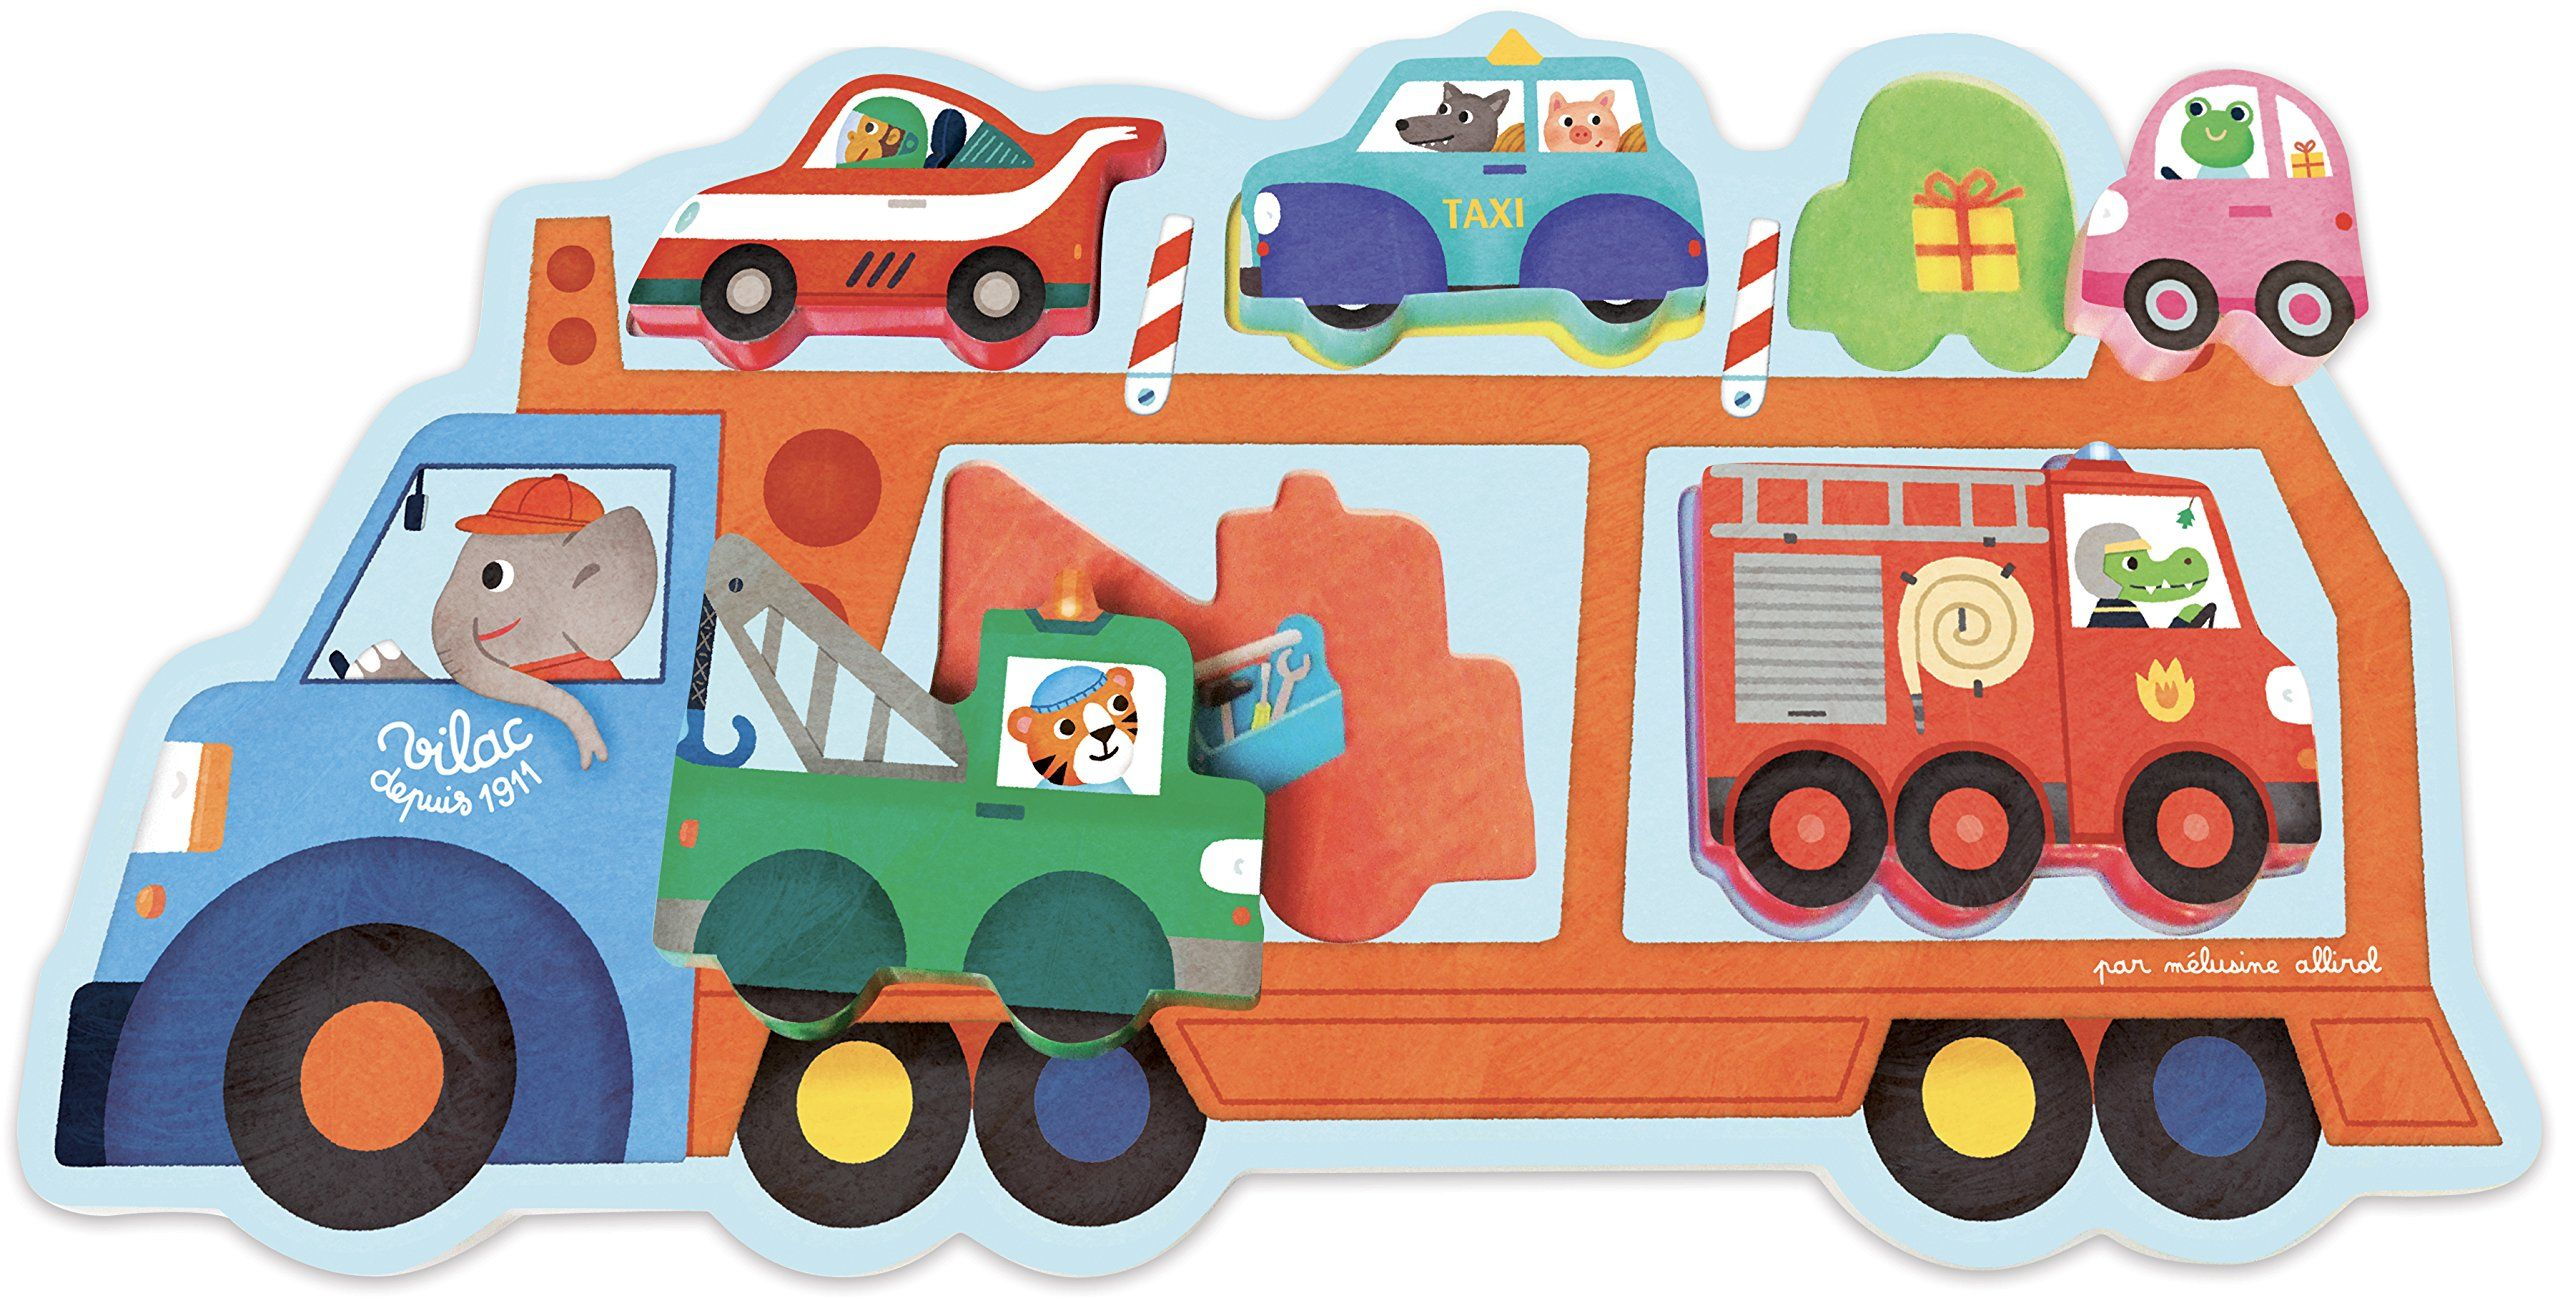 Vilac Vilac4630 Puzzle transportowe ciężarówki, wielokolorowe